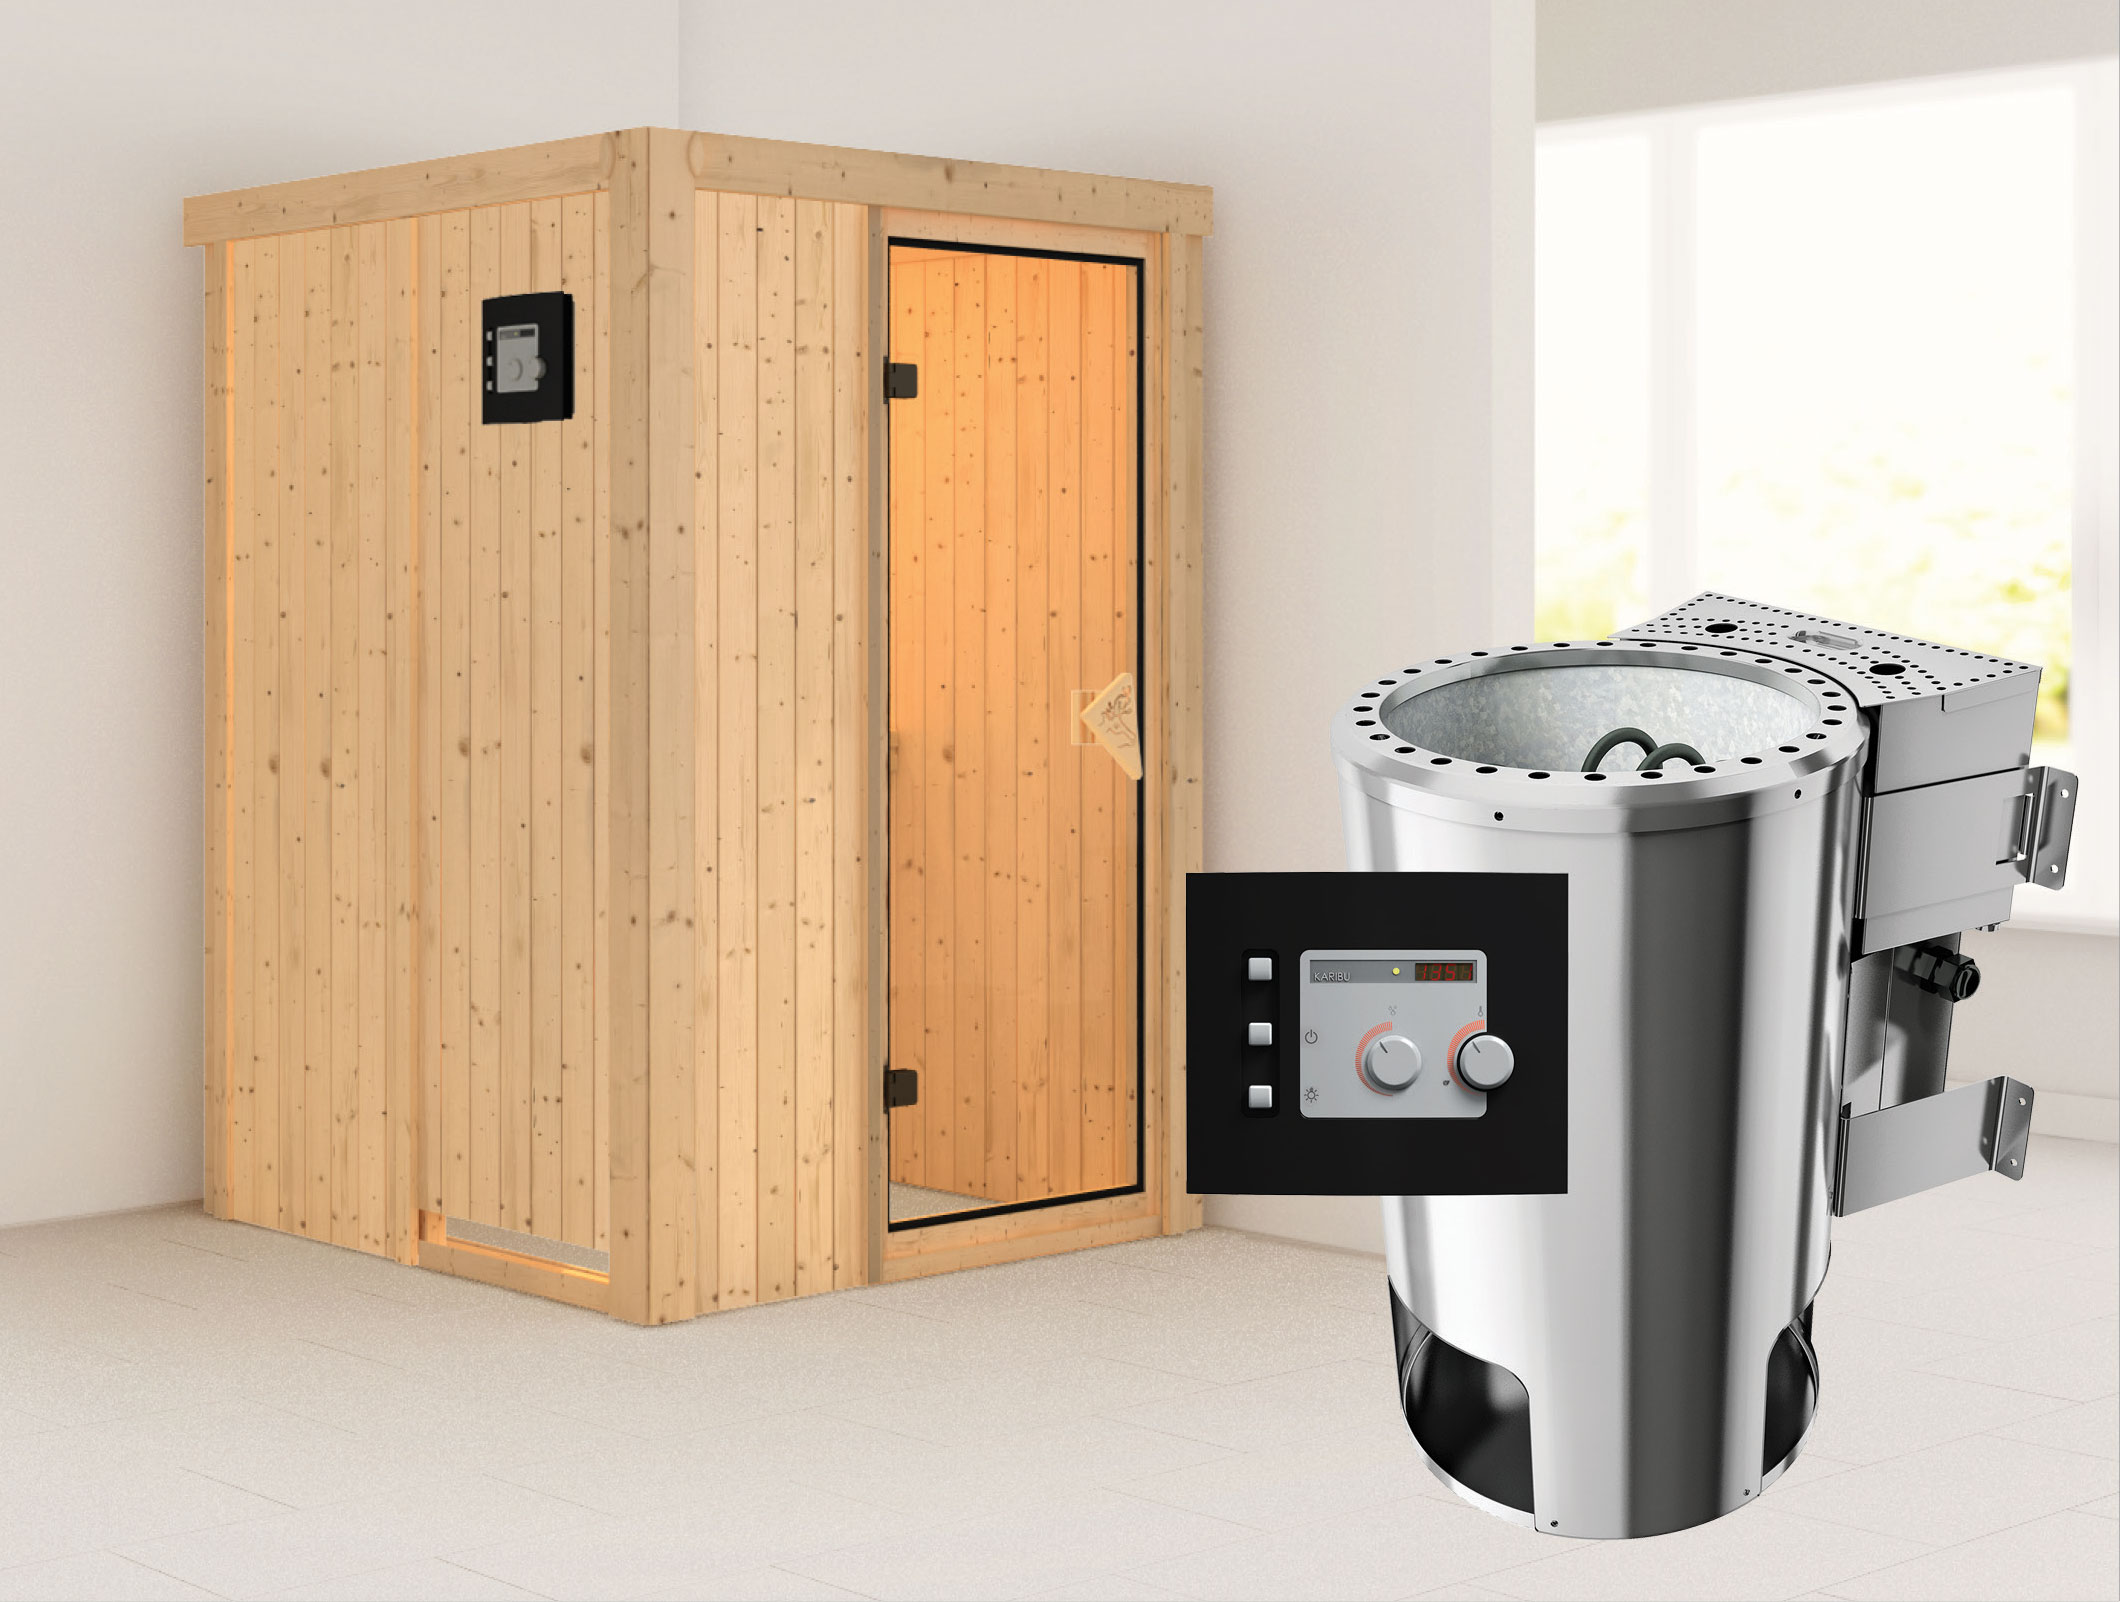 karibu sauna lenja 68mm 230v mit bio ofen 3 6kw extern classic t r bei. Black Bedroom Furniture Sets. Home Design Ideas